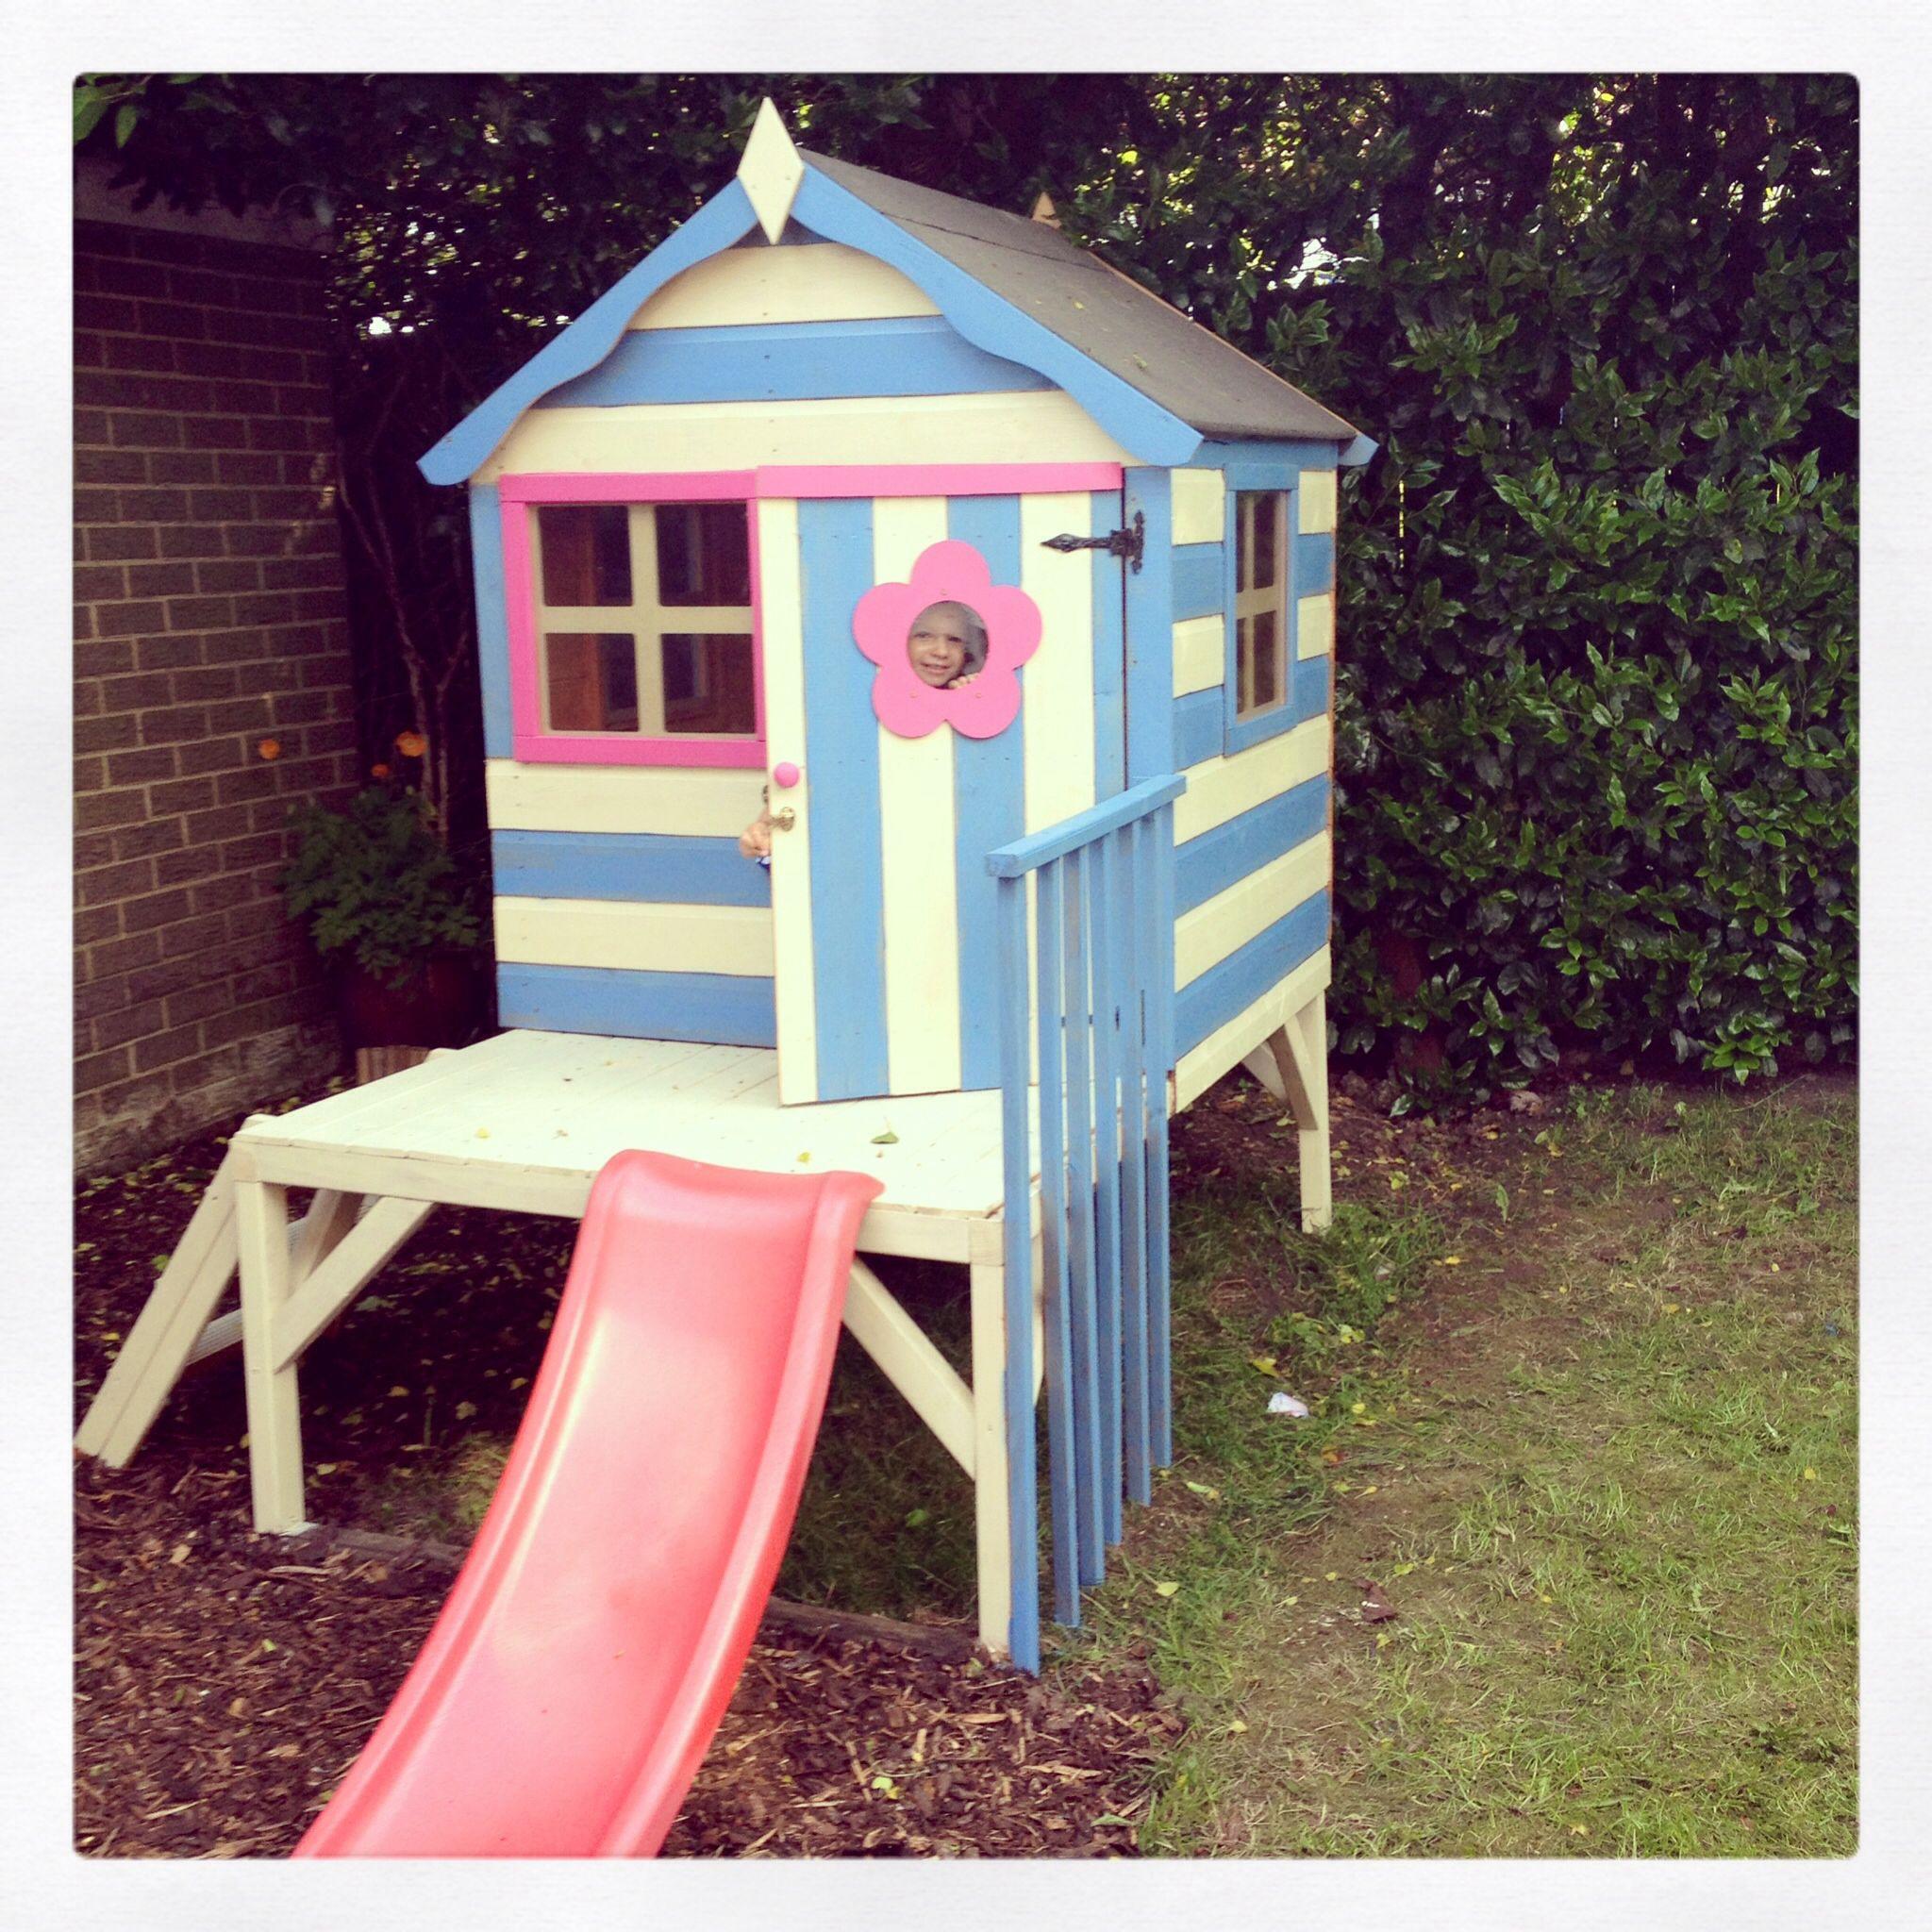 Beach hut playhouse playhouse decor ideas pinterest for Beach hut decoration ideas